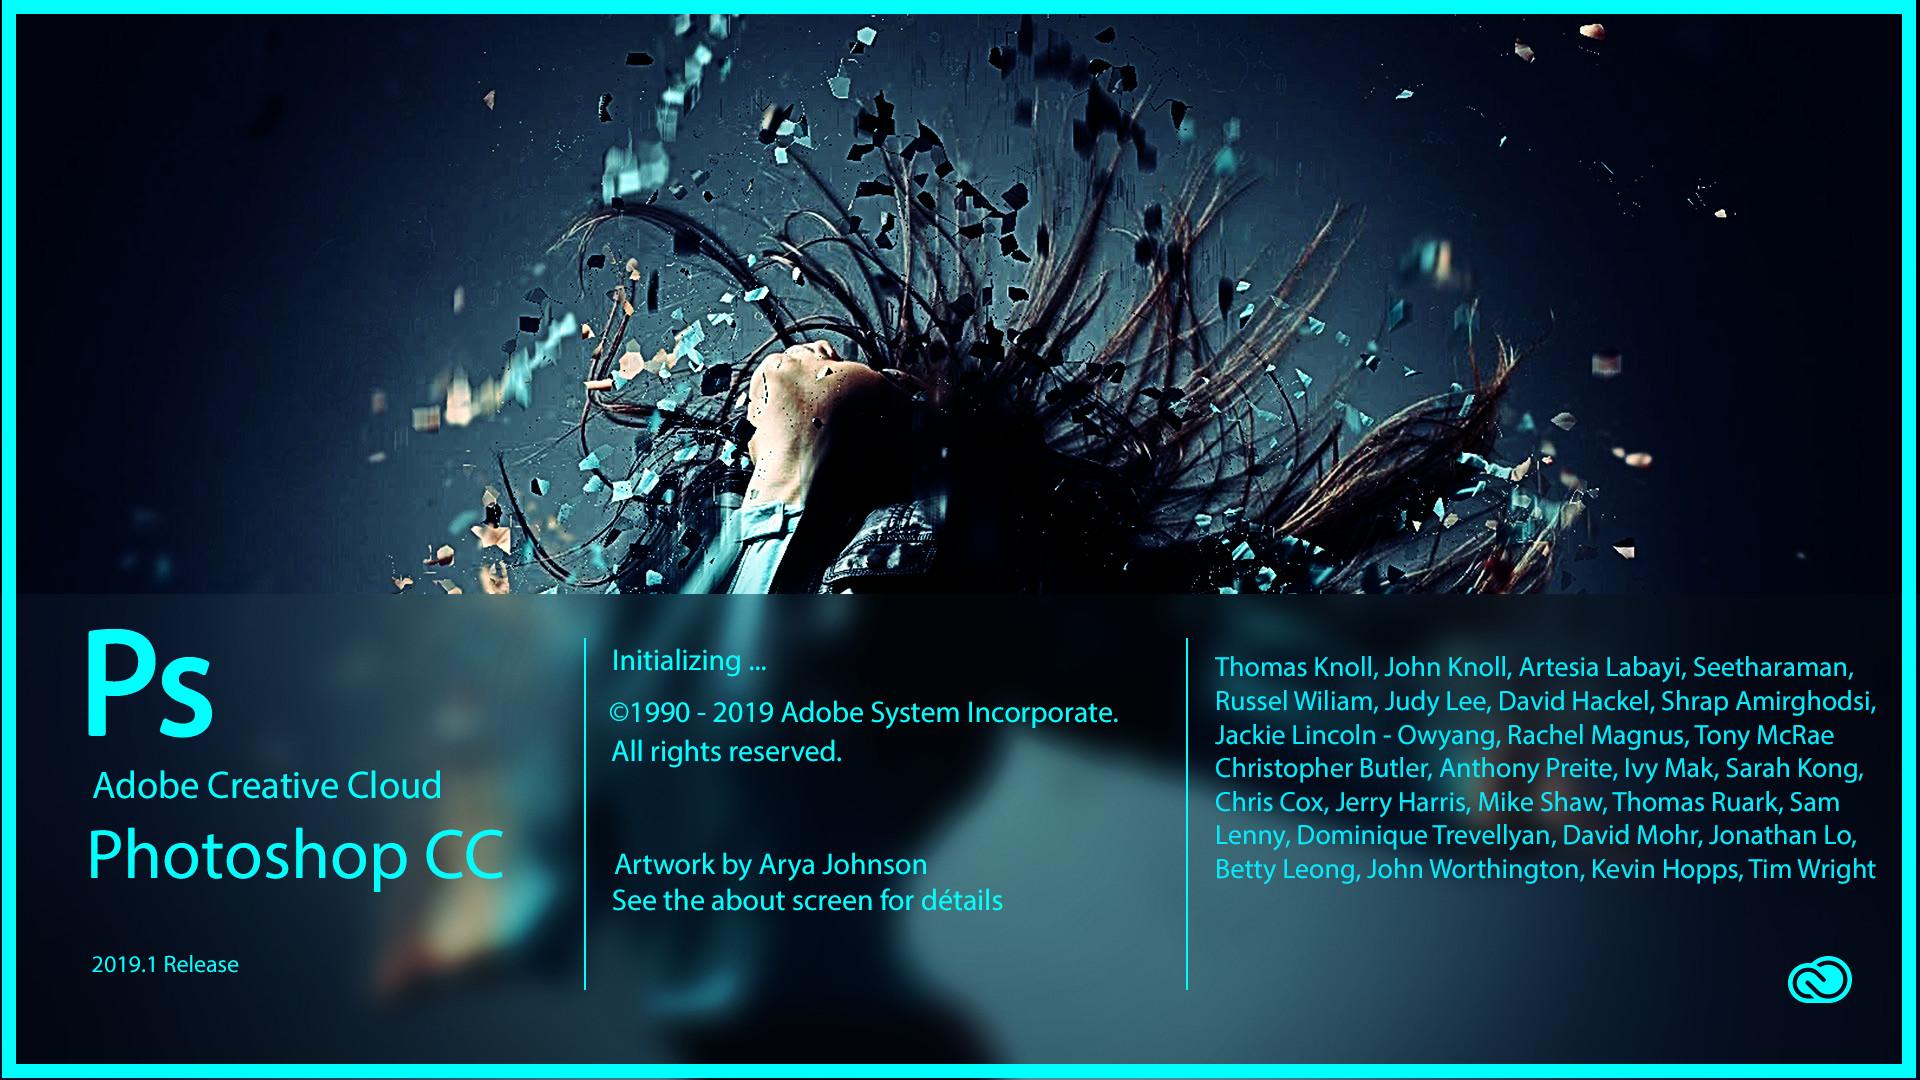 Adobe Photoshop CC 2019 20.0.3 X64 Full Version   Freewaresys - Download Free Software